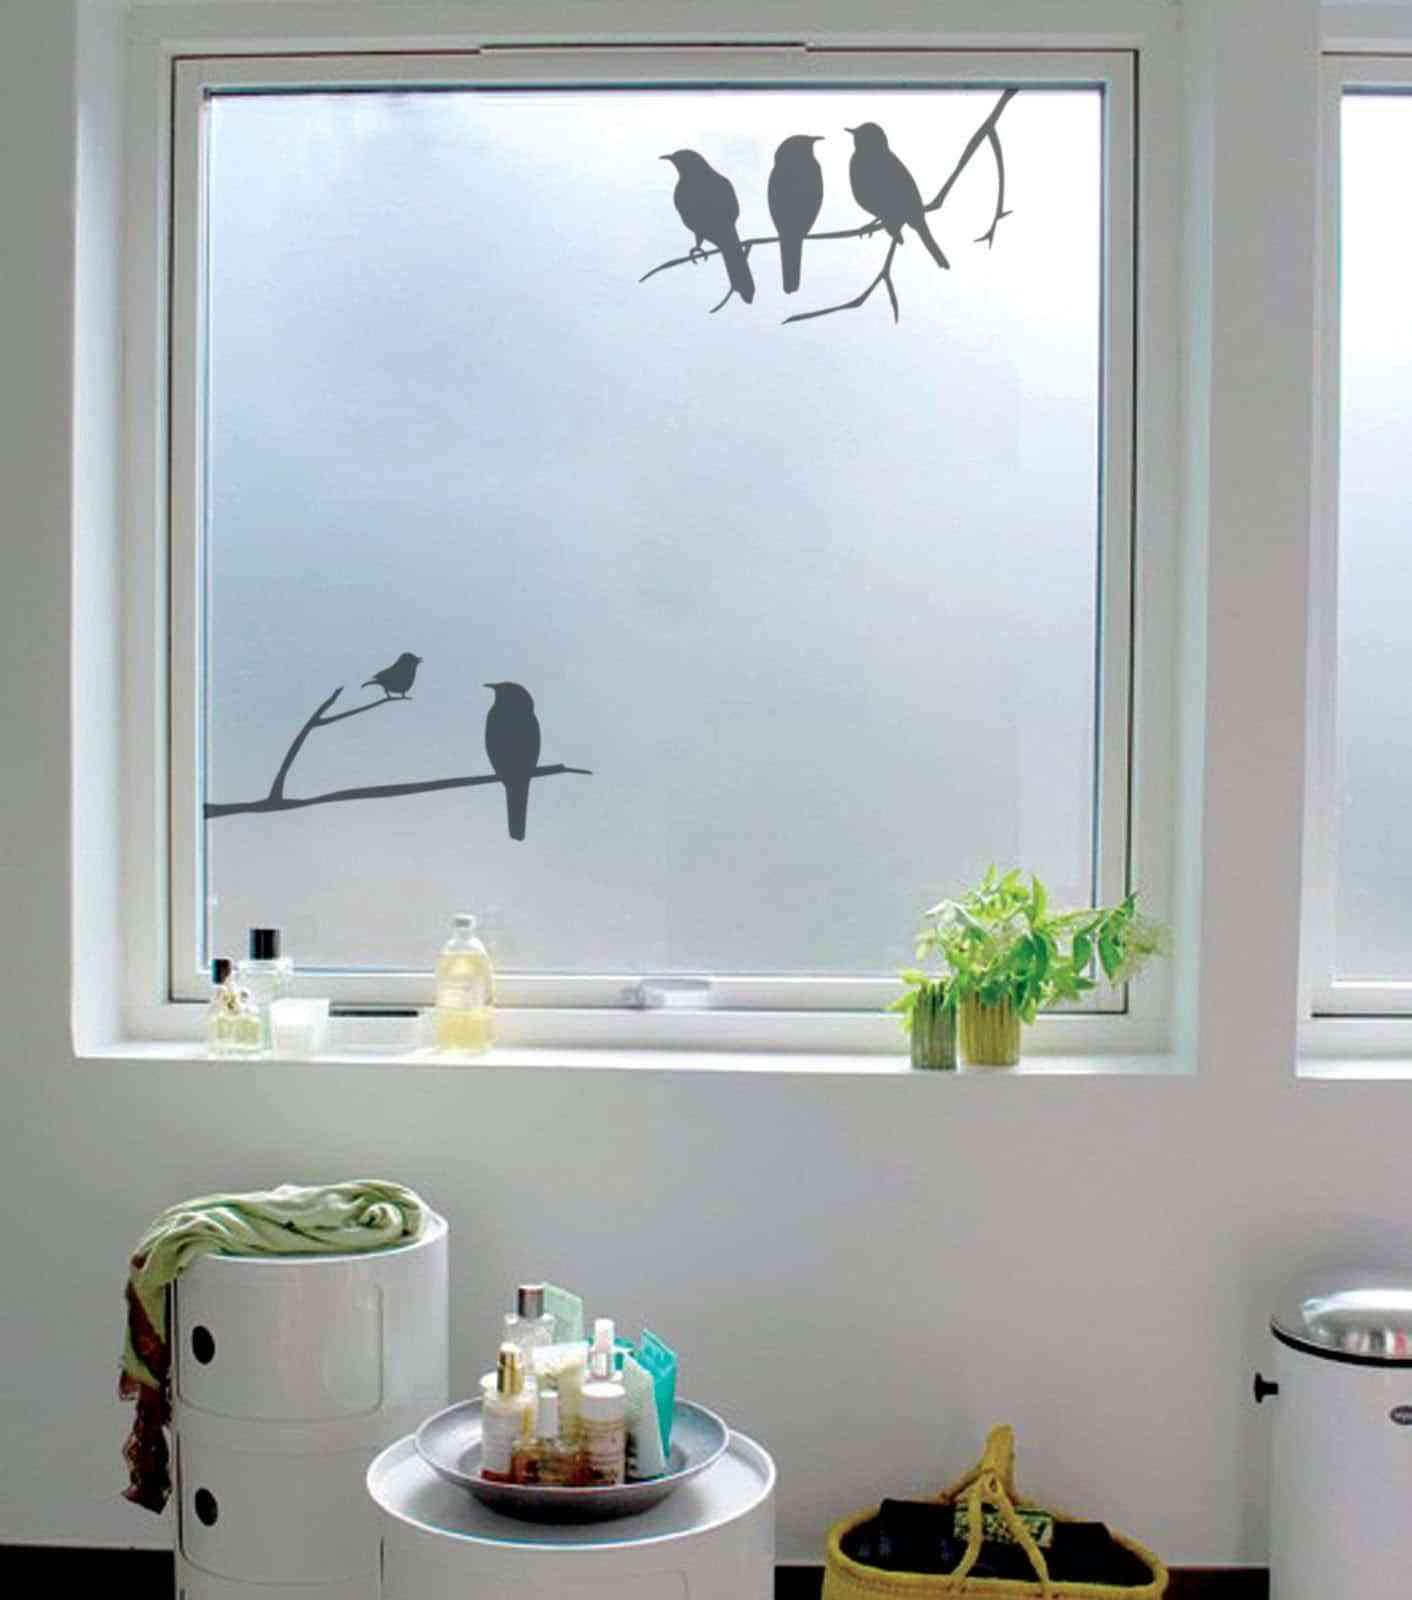 Vinilos o cristales decorativos para ventanas con celos - Pegatinas para mamparas de bano ...